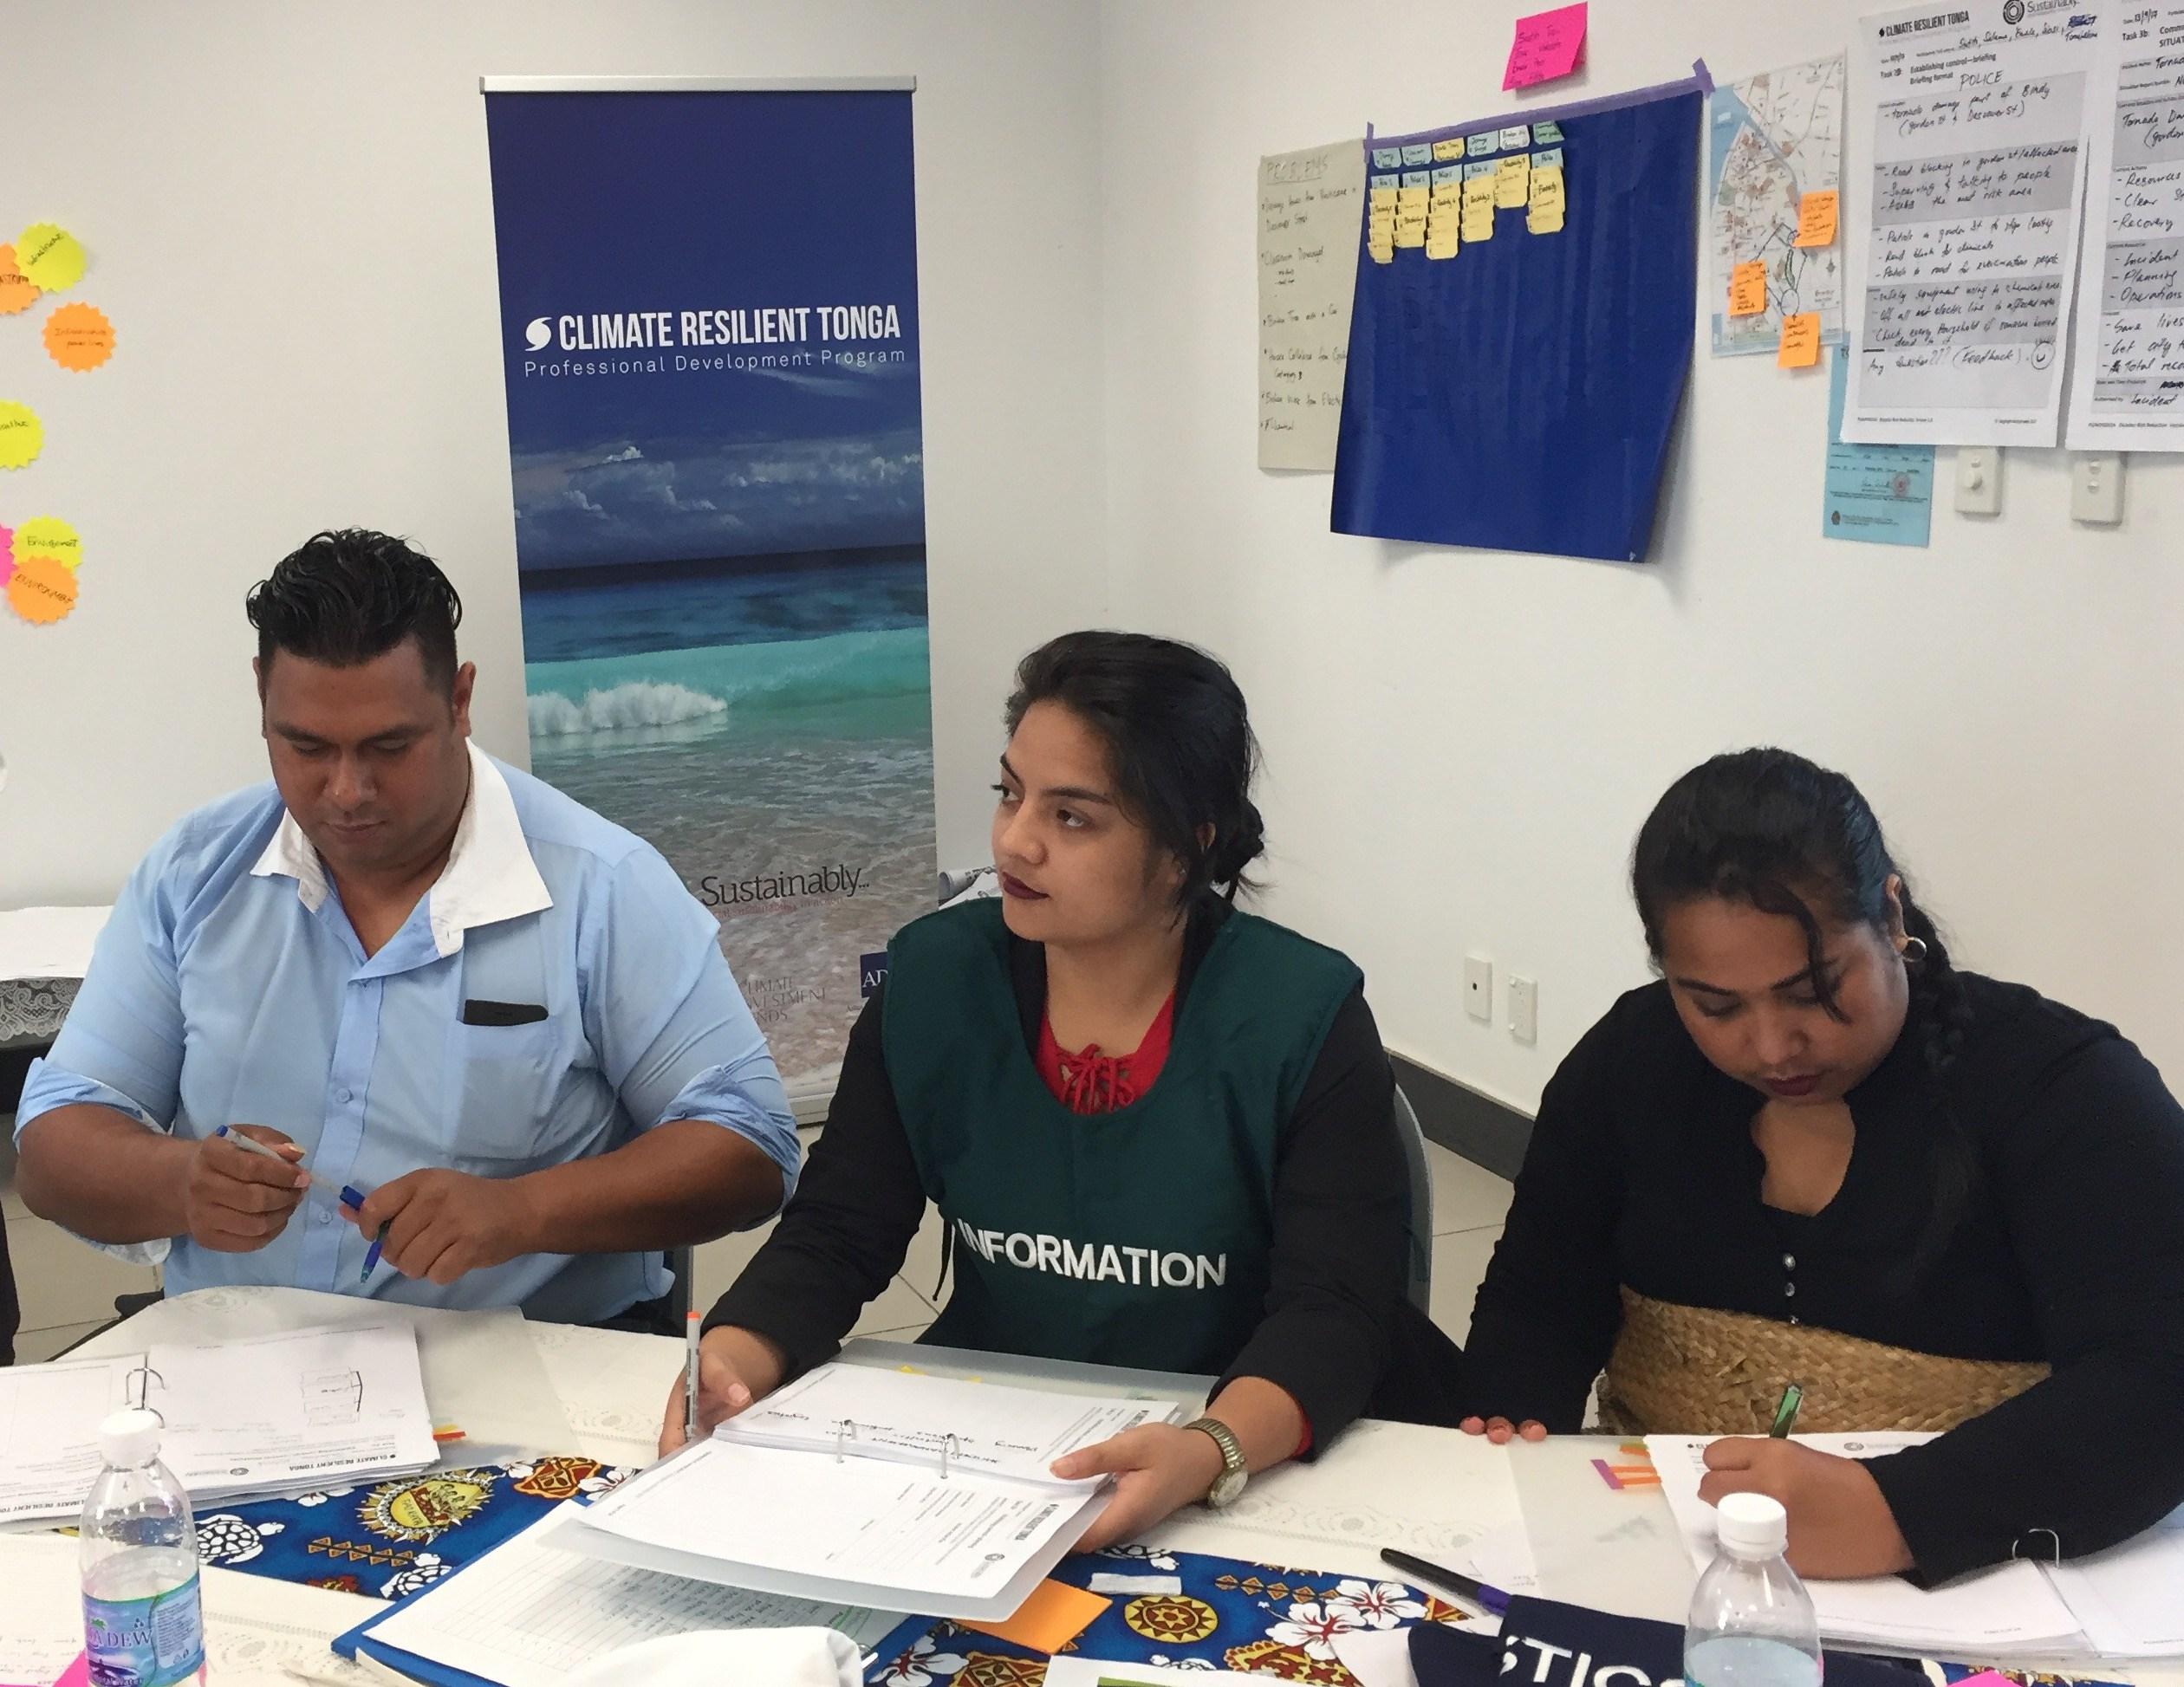 Resilience Profiling Workshop in Tonga